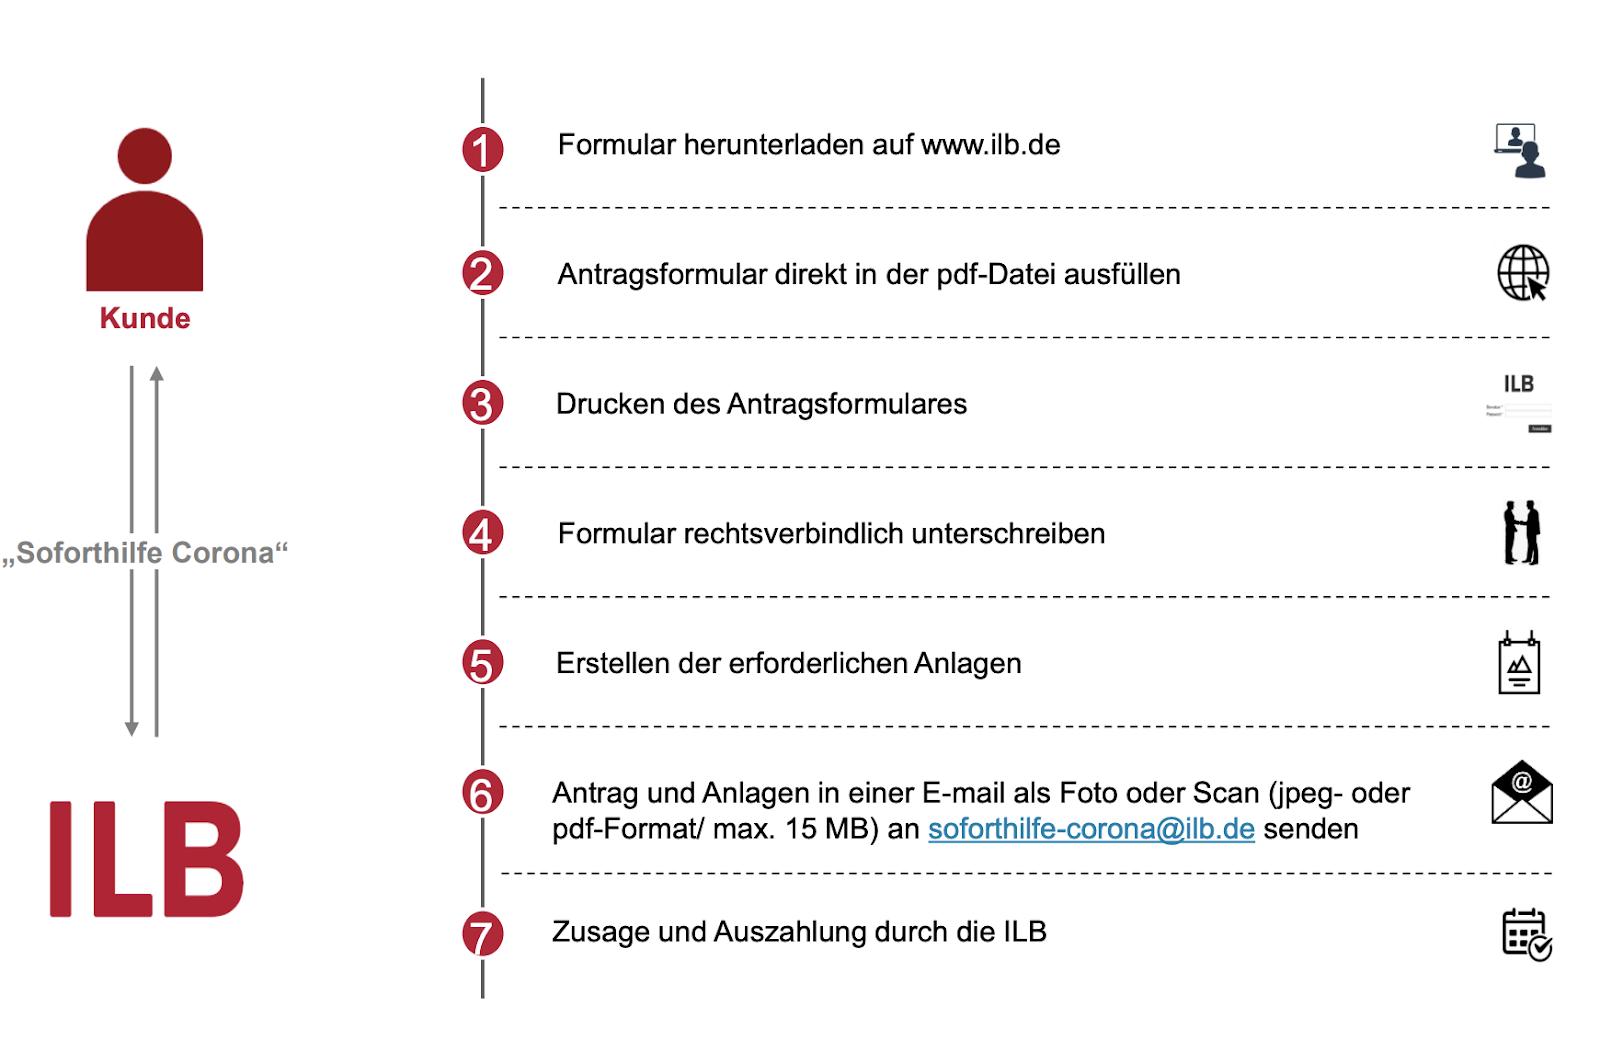 Antragstellung Soforthilfe Corona Brandenburg, Quelle: Merkblatt ILB